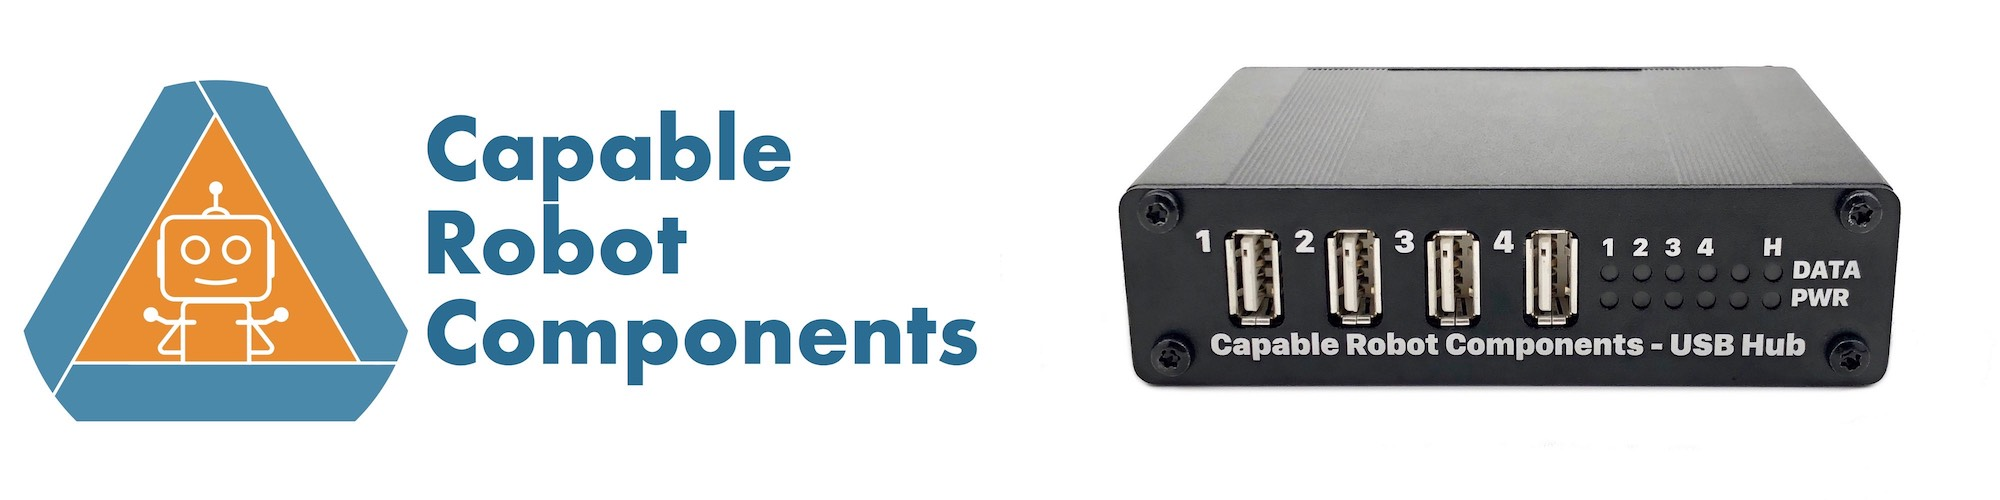 Capable Robot logo & image of Programmable USB Hub